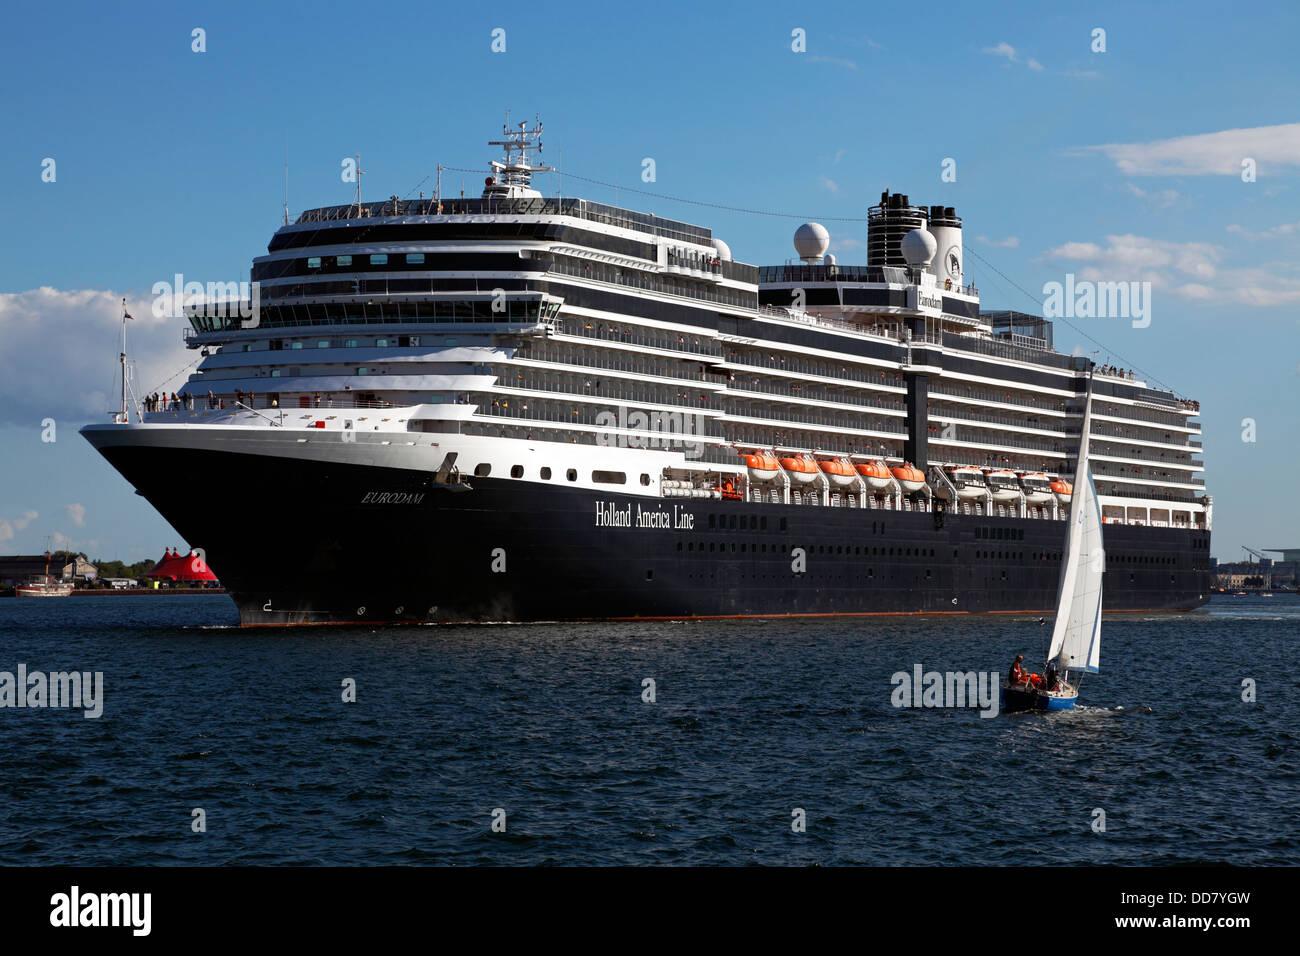 The Cruise Ship Ms Eurodam From Holland America Line